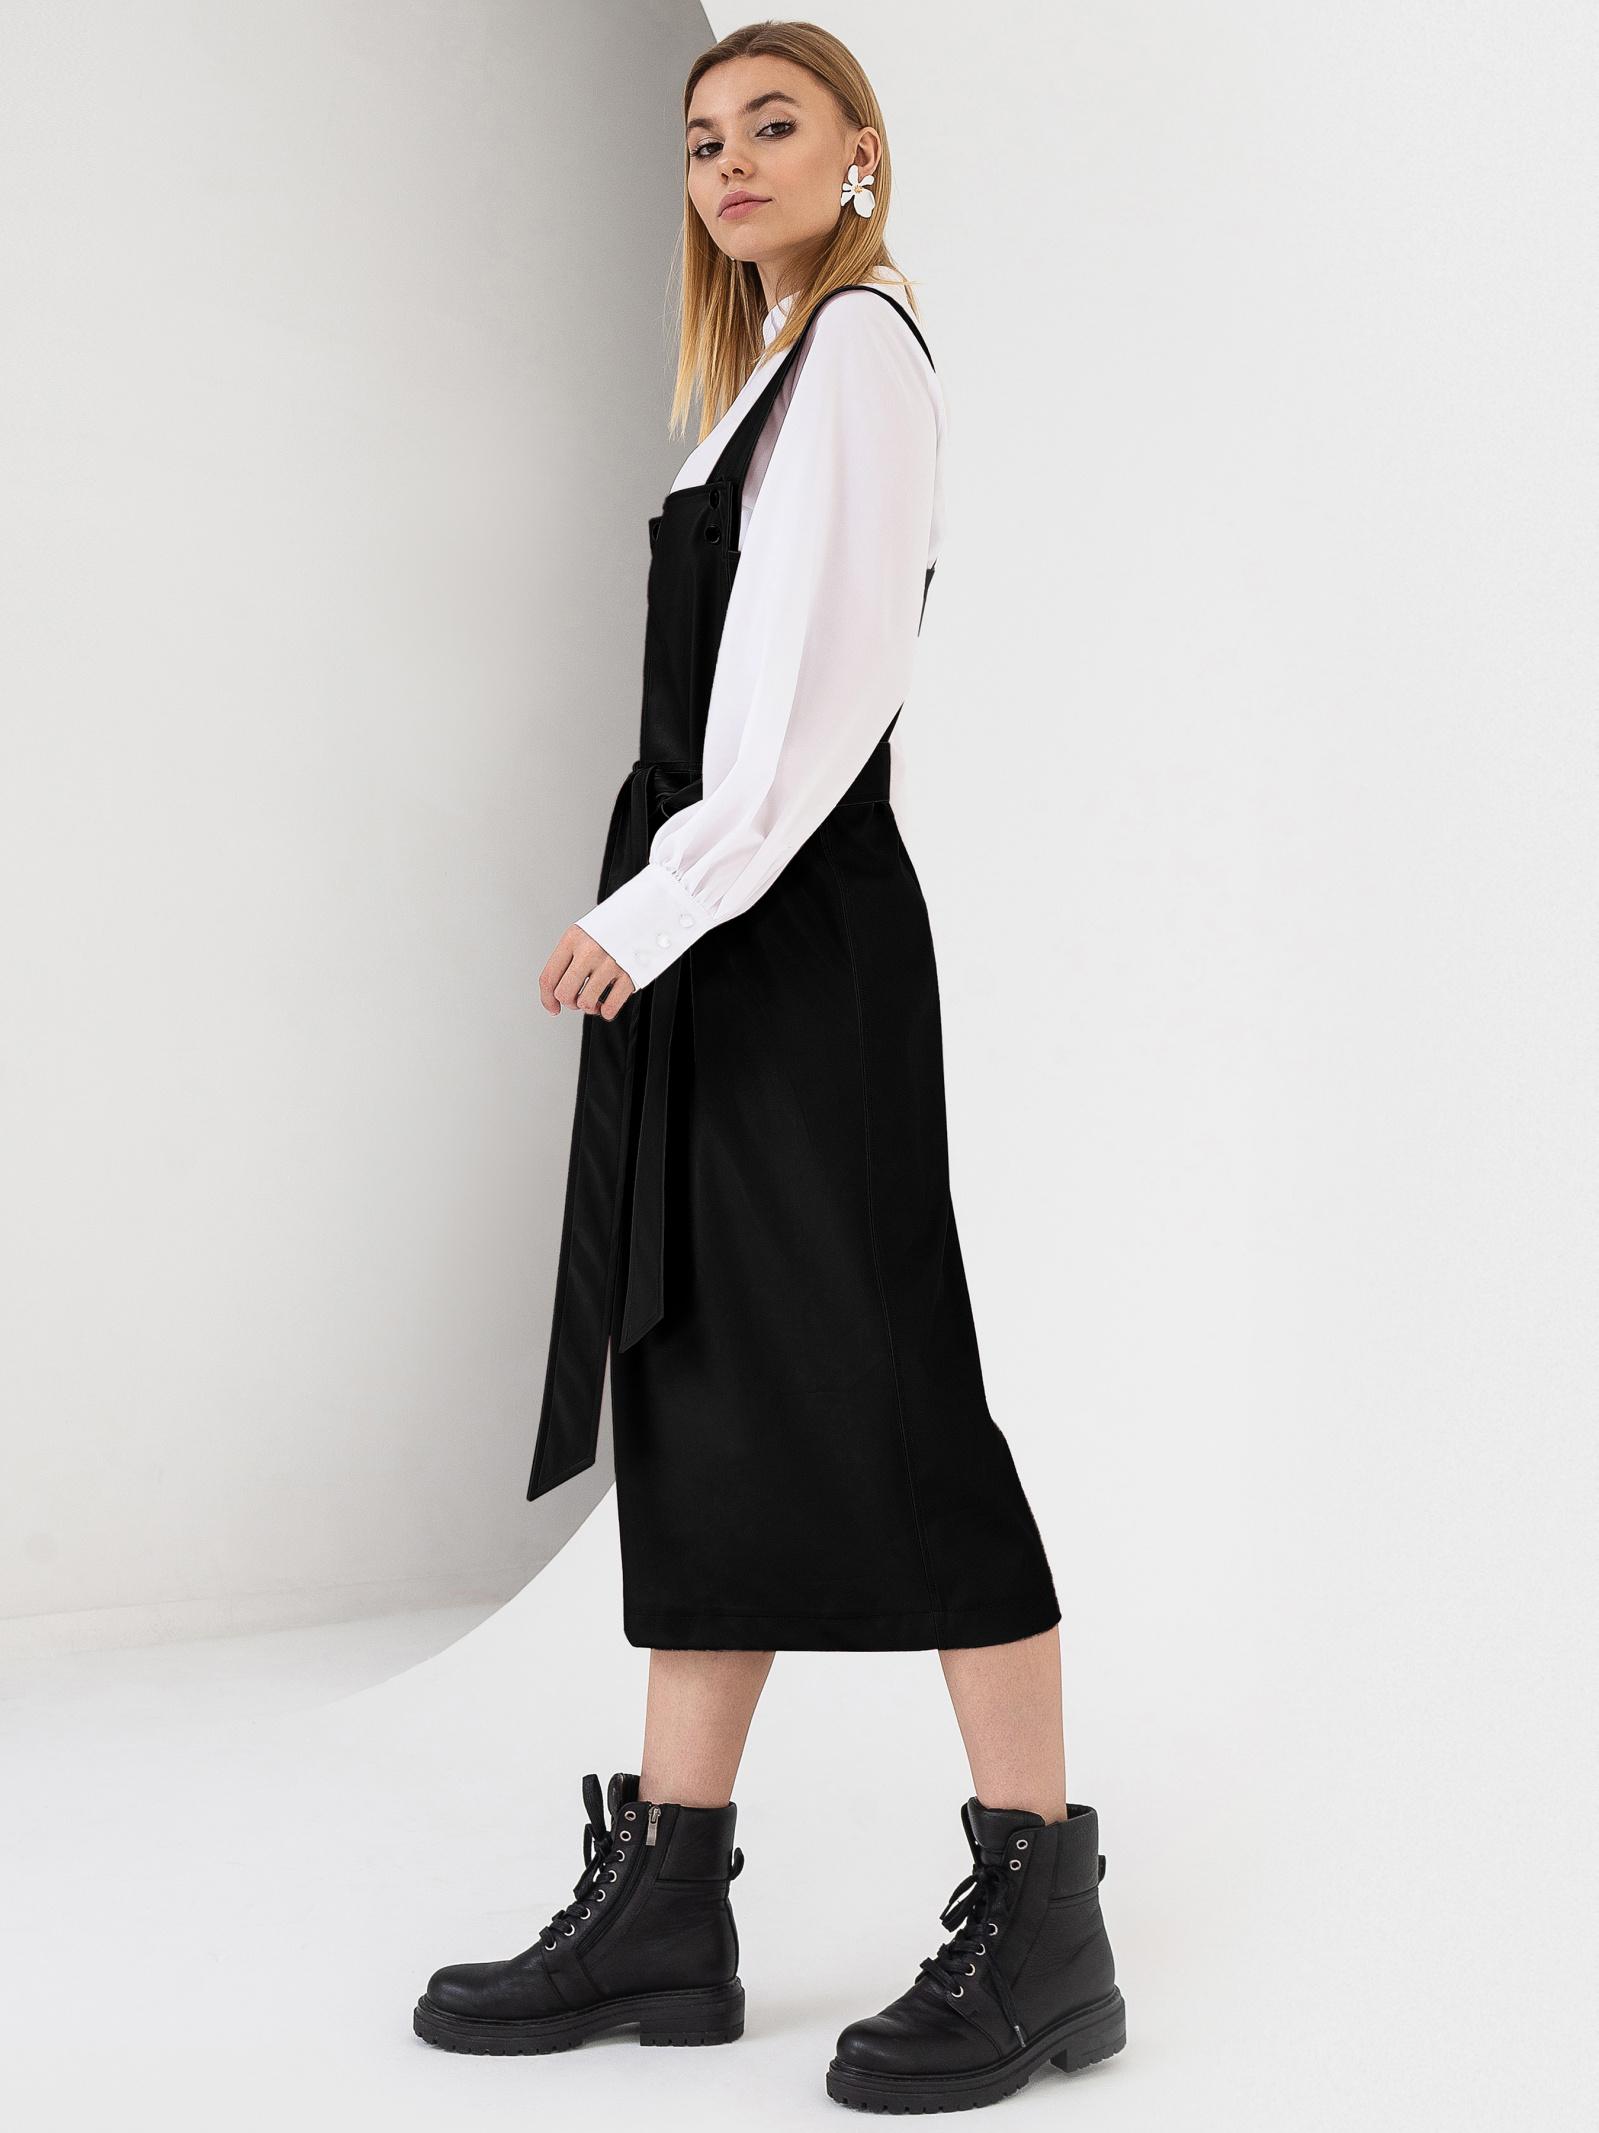 VOVK Сарафан жіночі модель 07495 чорний , 2017